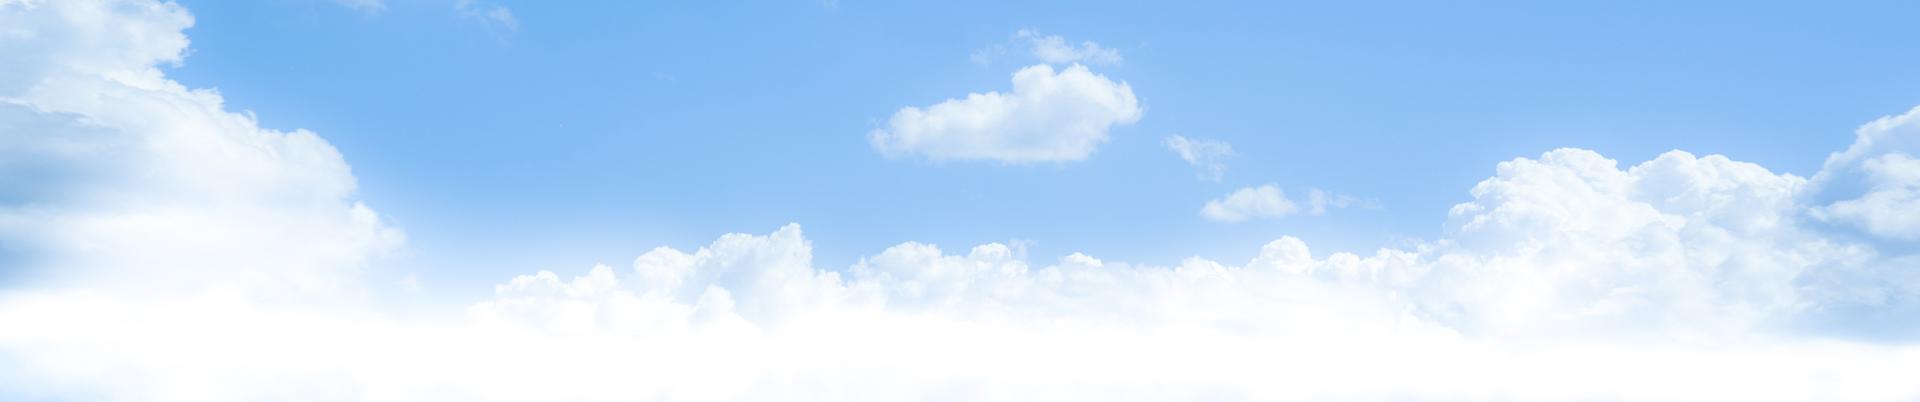 tło_chmury-2